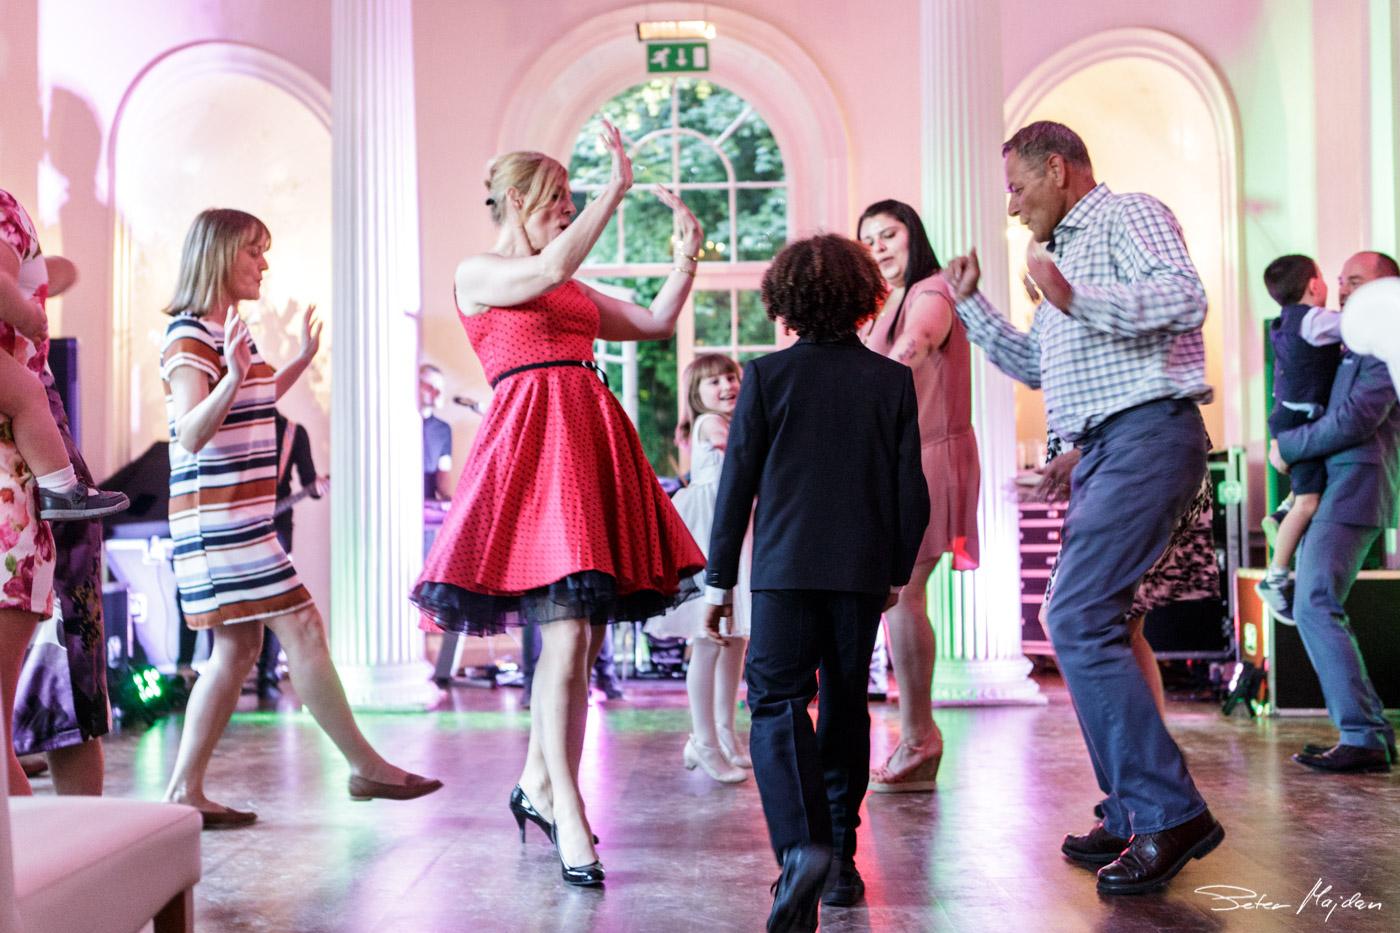 Colwick-hall-wedding-photography-72.jpg